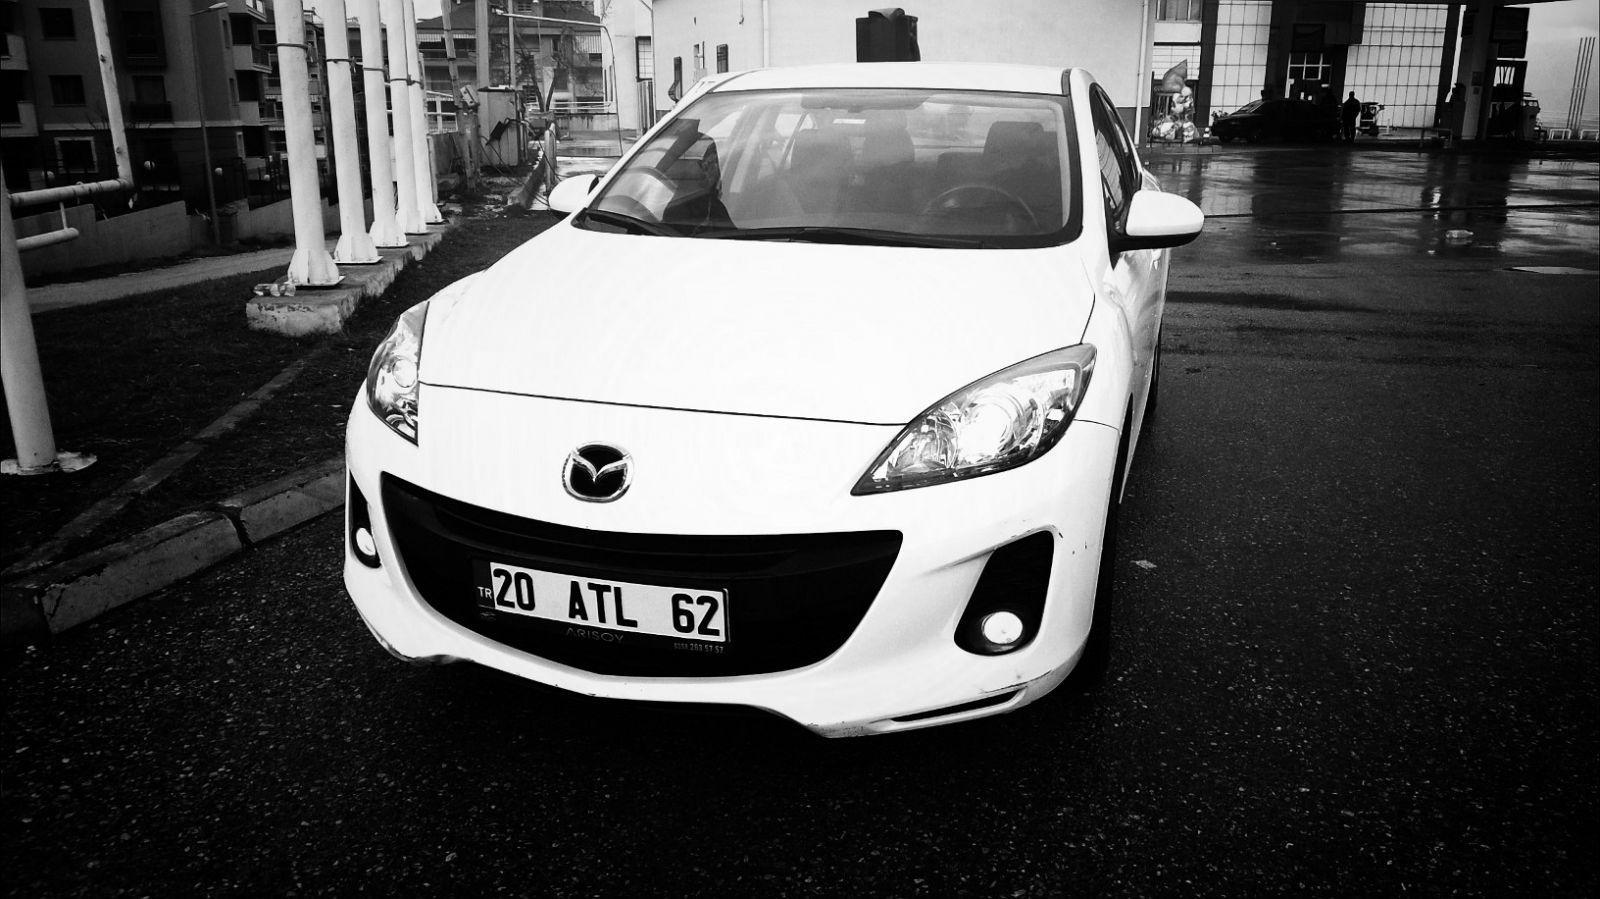 CaNaVaRıM (2012 Mazda 3 1.6D Touring)